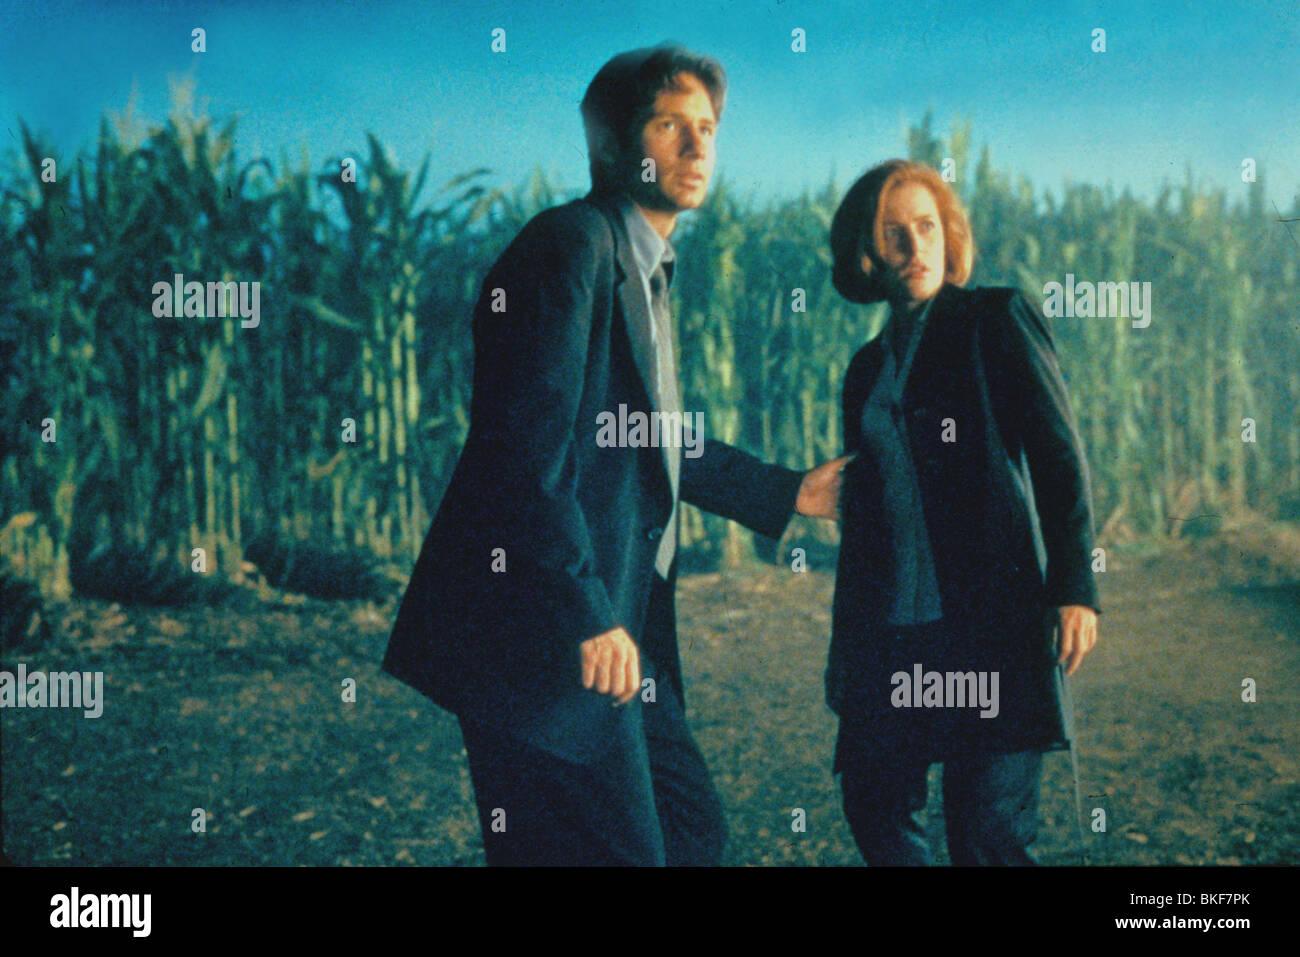 X-FILES: THE MOVIE (1998) DAVID DUCHOVNY, GILLIAN ANDERSON XFM 045 - Stock Image